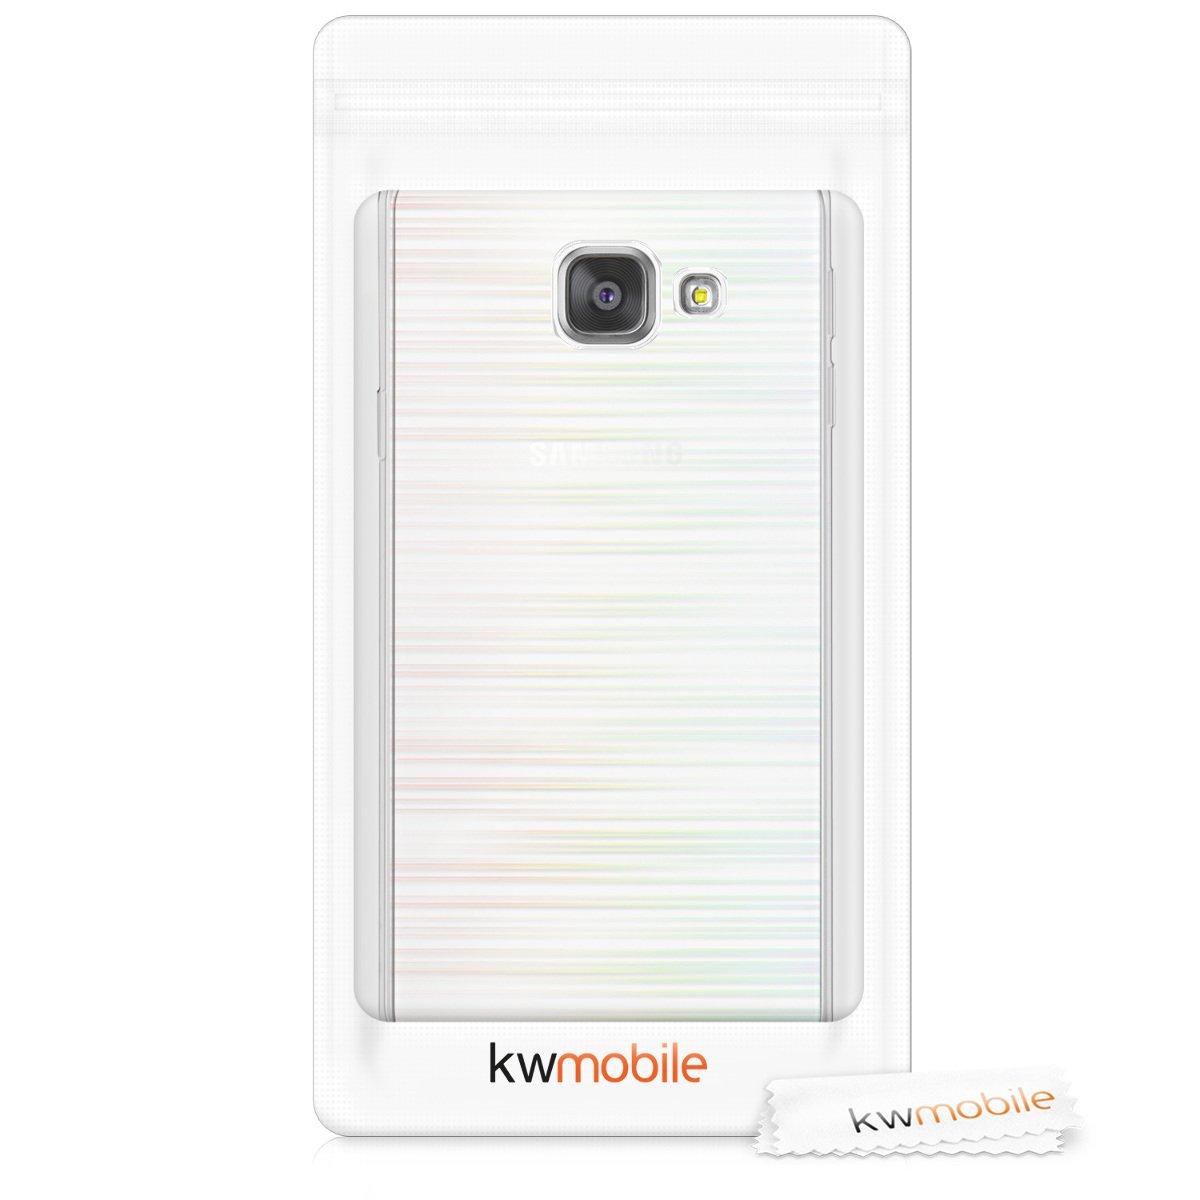 - Housse de t/él/éphone en Silicone Noir-Transparent - Coque pour Samsung Galaxy A3 kwmobile Coque Samsung Galaxy A3 2016 2016